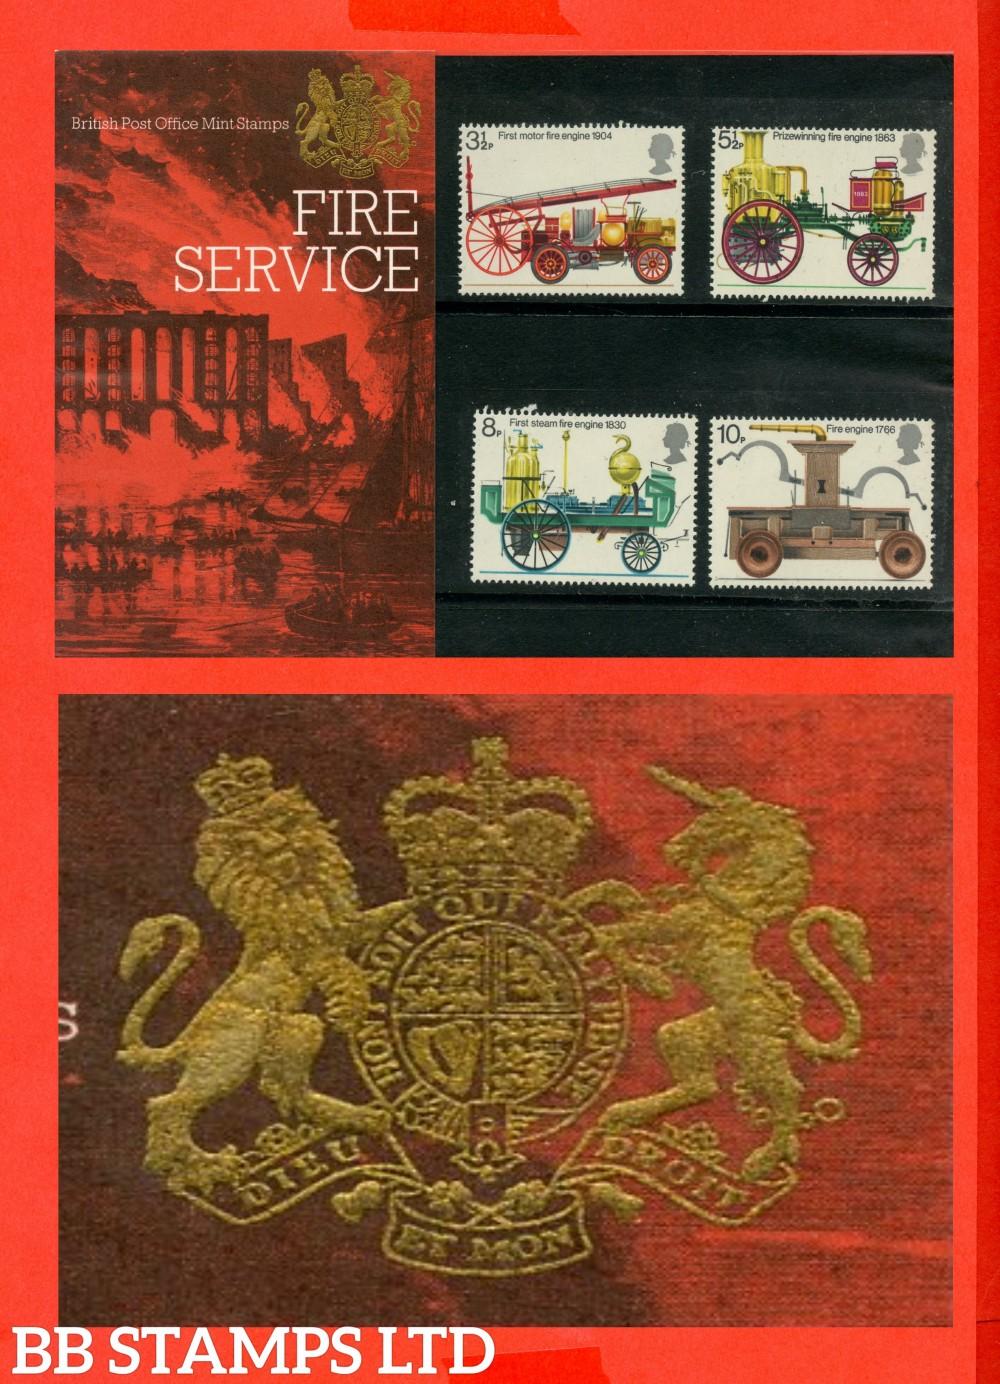 1974 Fire Service Pres Pack Type B = Flower Between Unicorn's Legs.